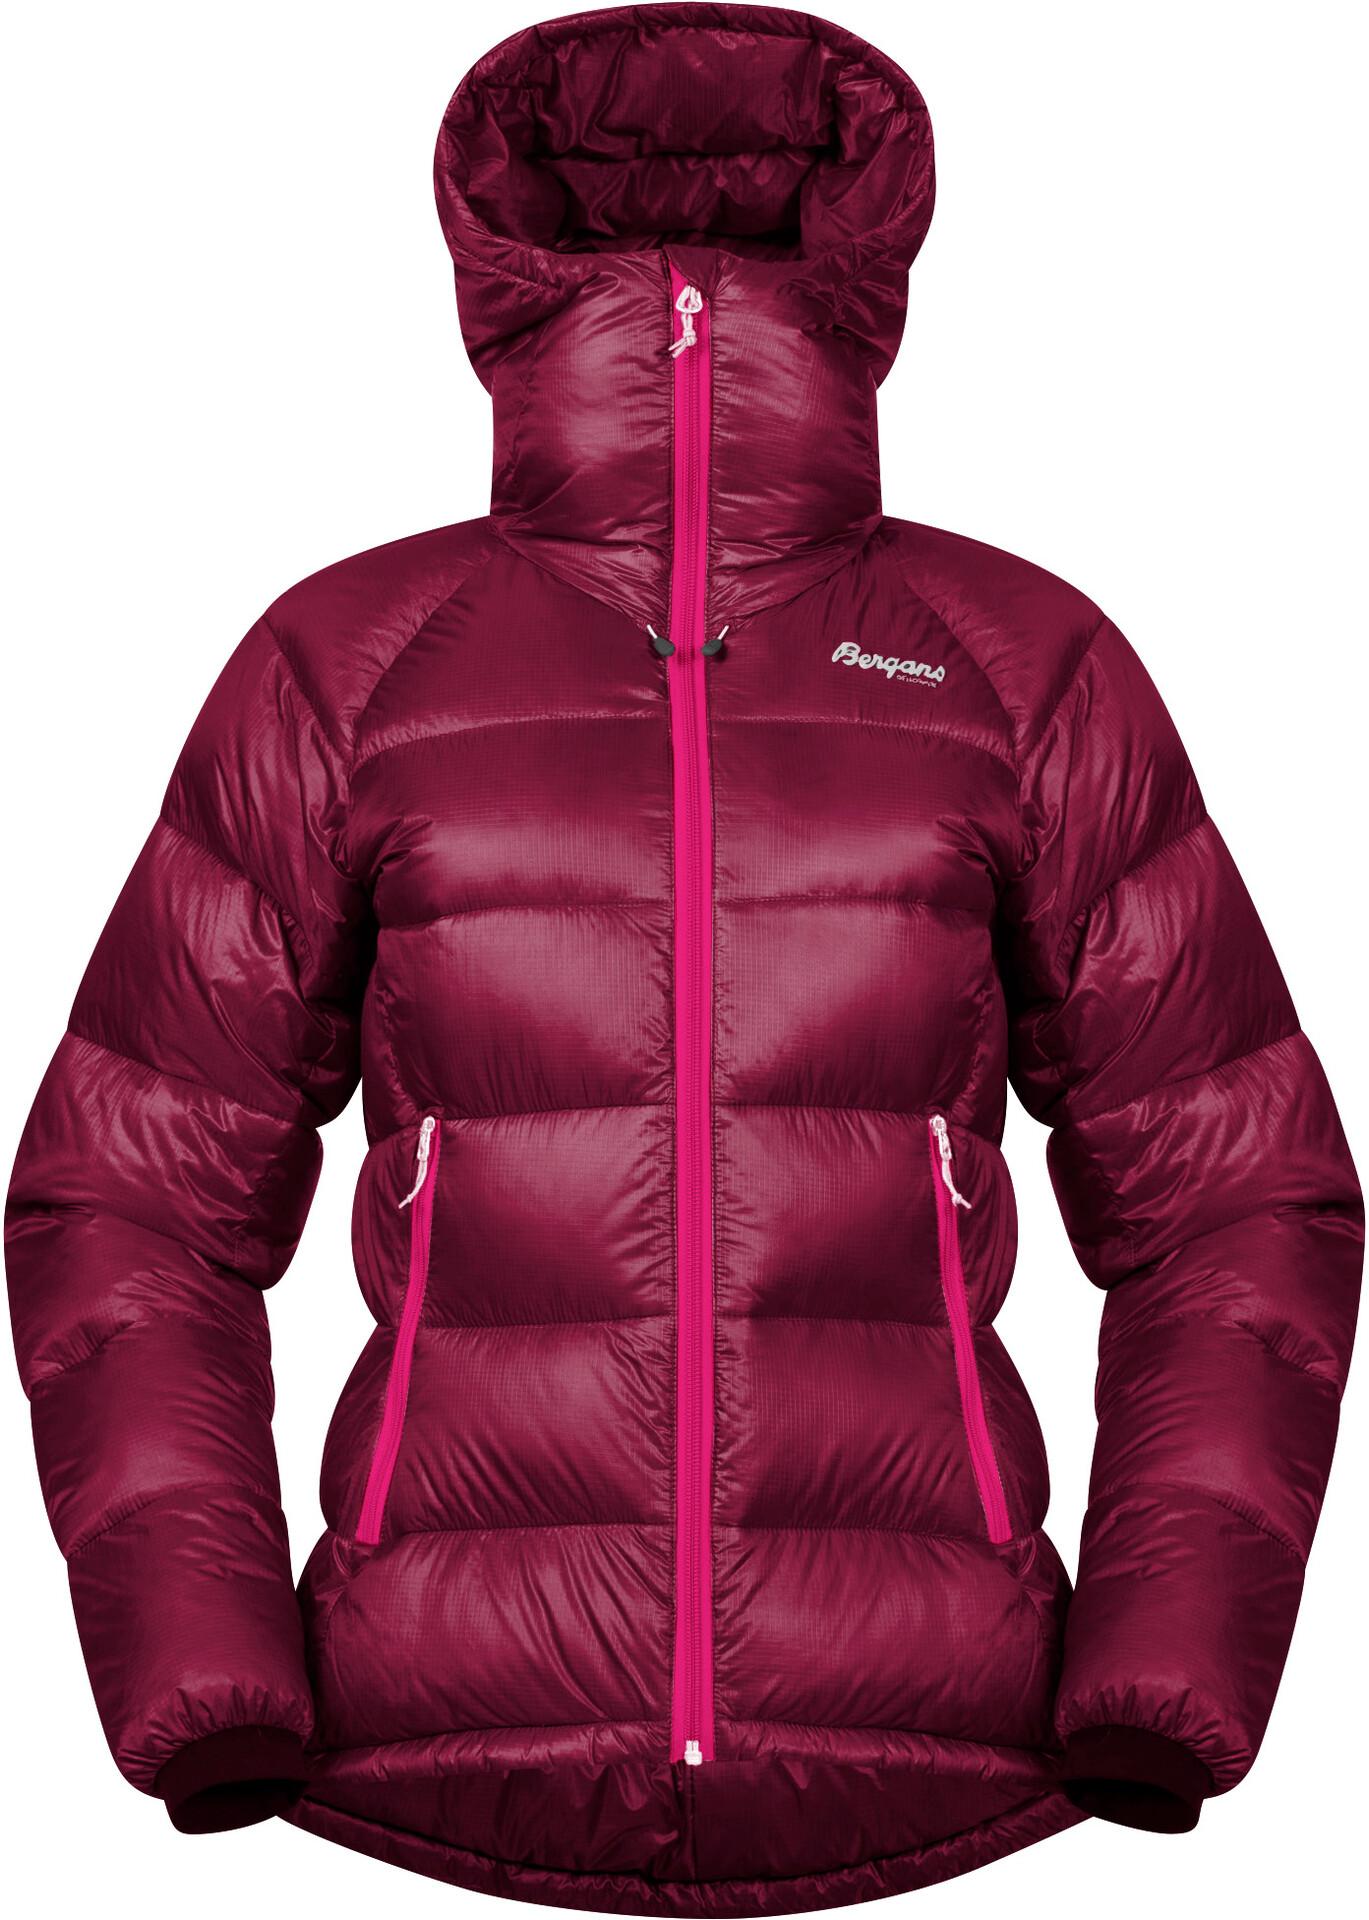 Bergans Slingsby Down Light Jacket with Hood Women purple velvet//beet red 2019 winter jacket